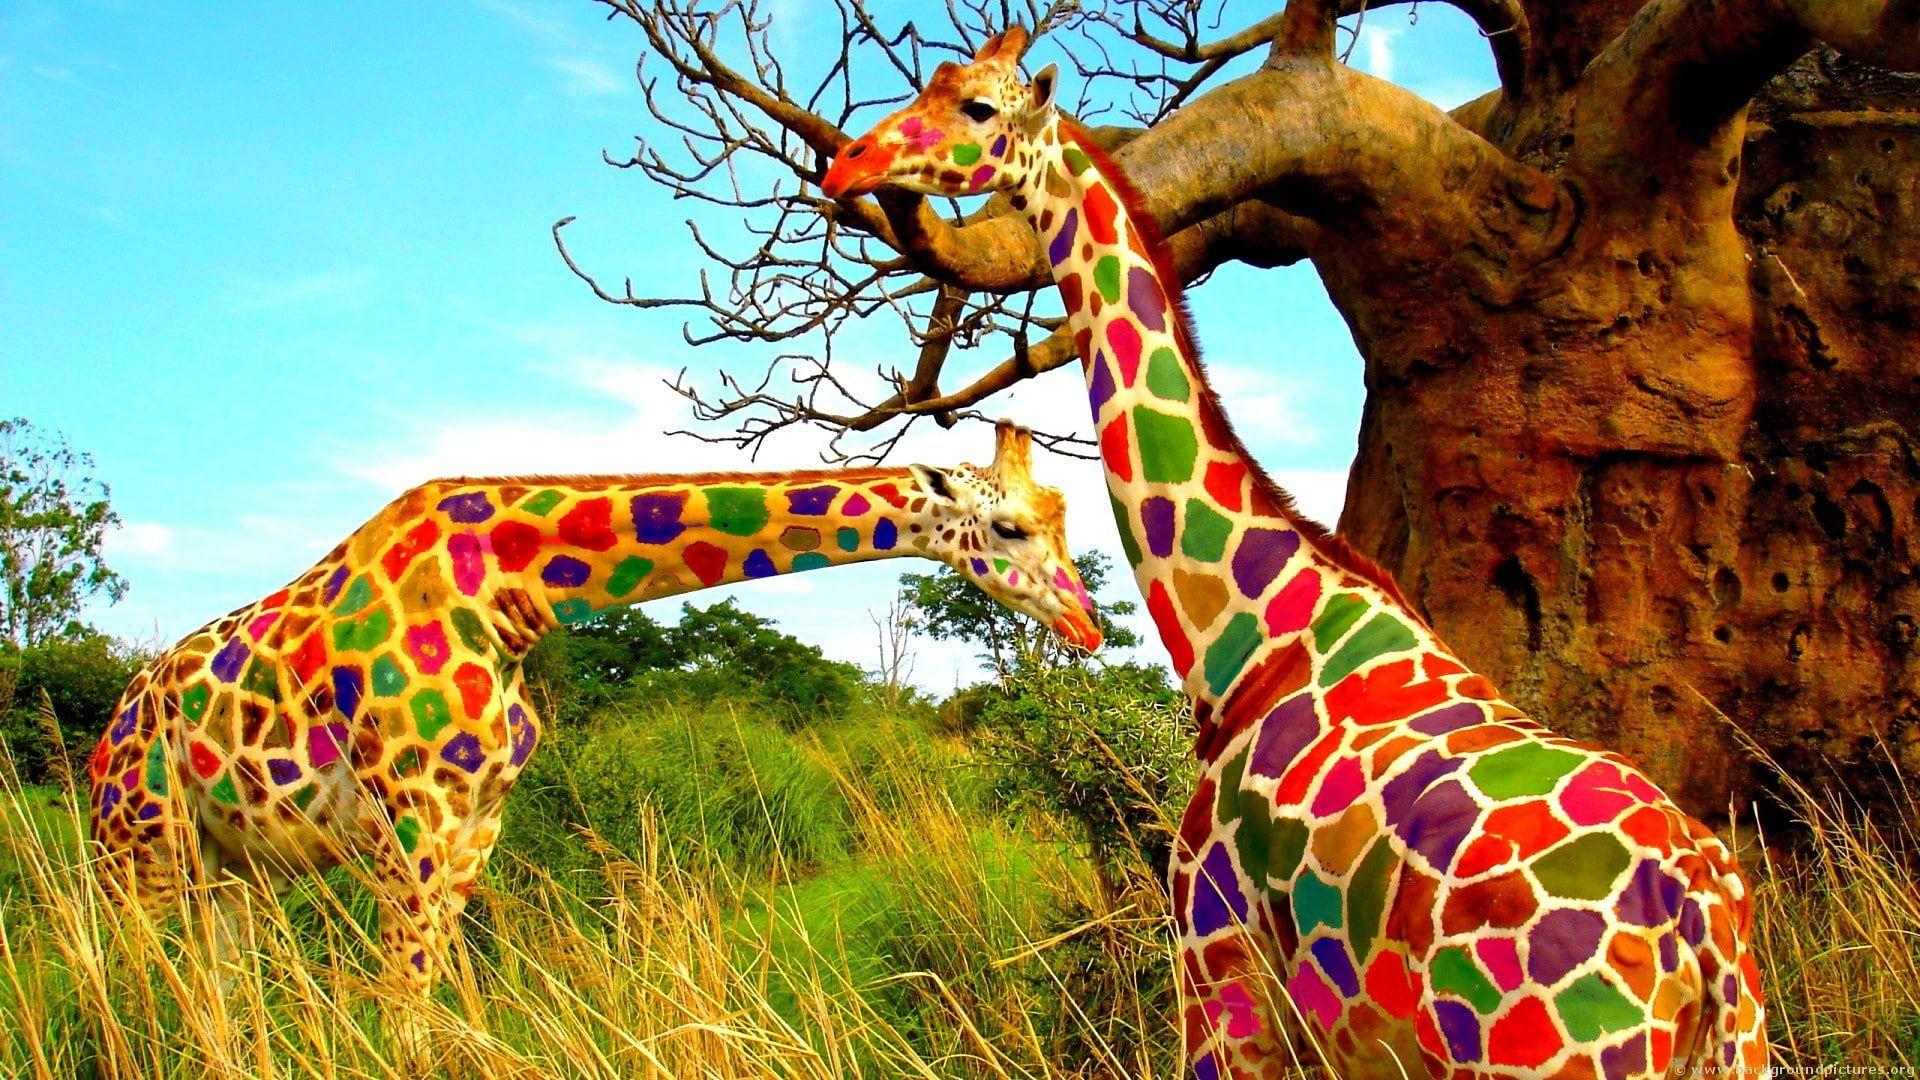 Nature Animals Landscape Giraffes Trees Colorful Grass Humor Photo Manipulation 1080p Wallpaper Hdwallp Animal Wallpaper Funny Animal Videos Animals